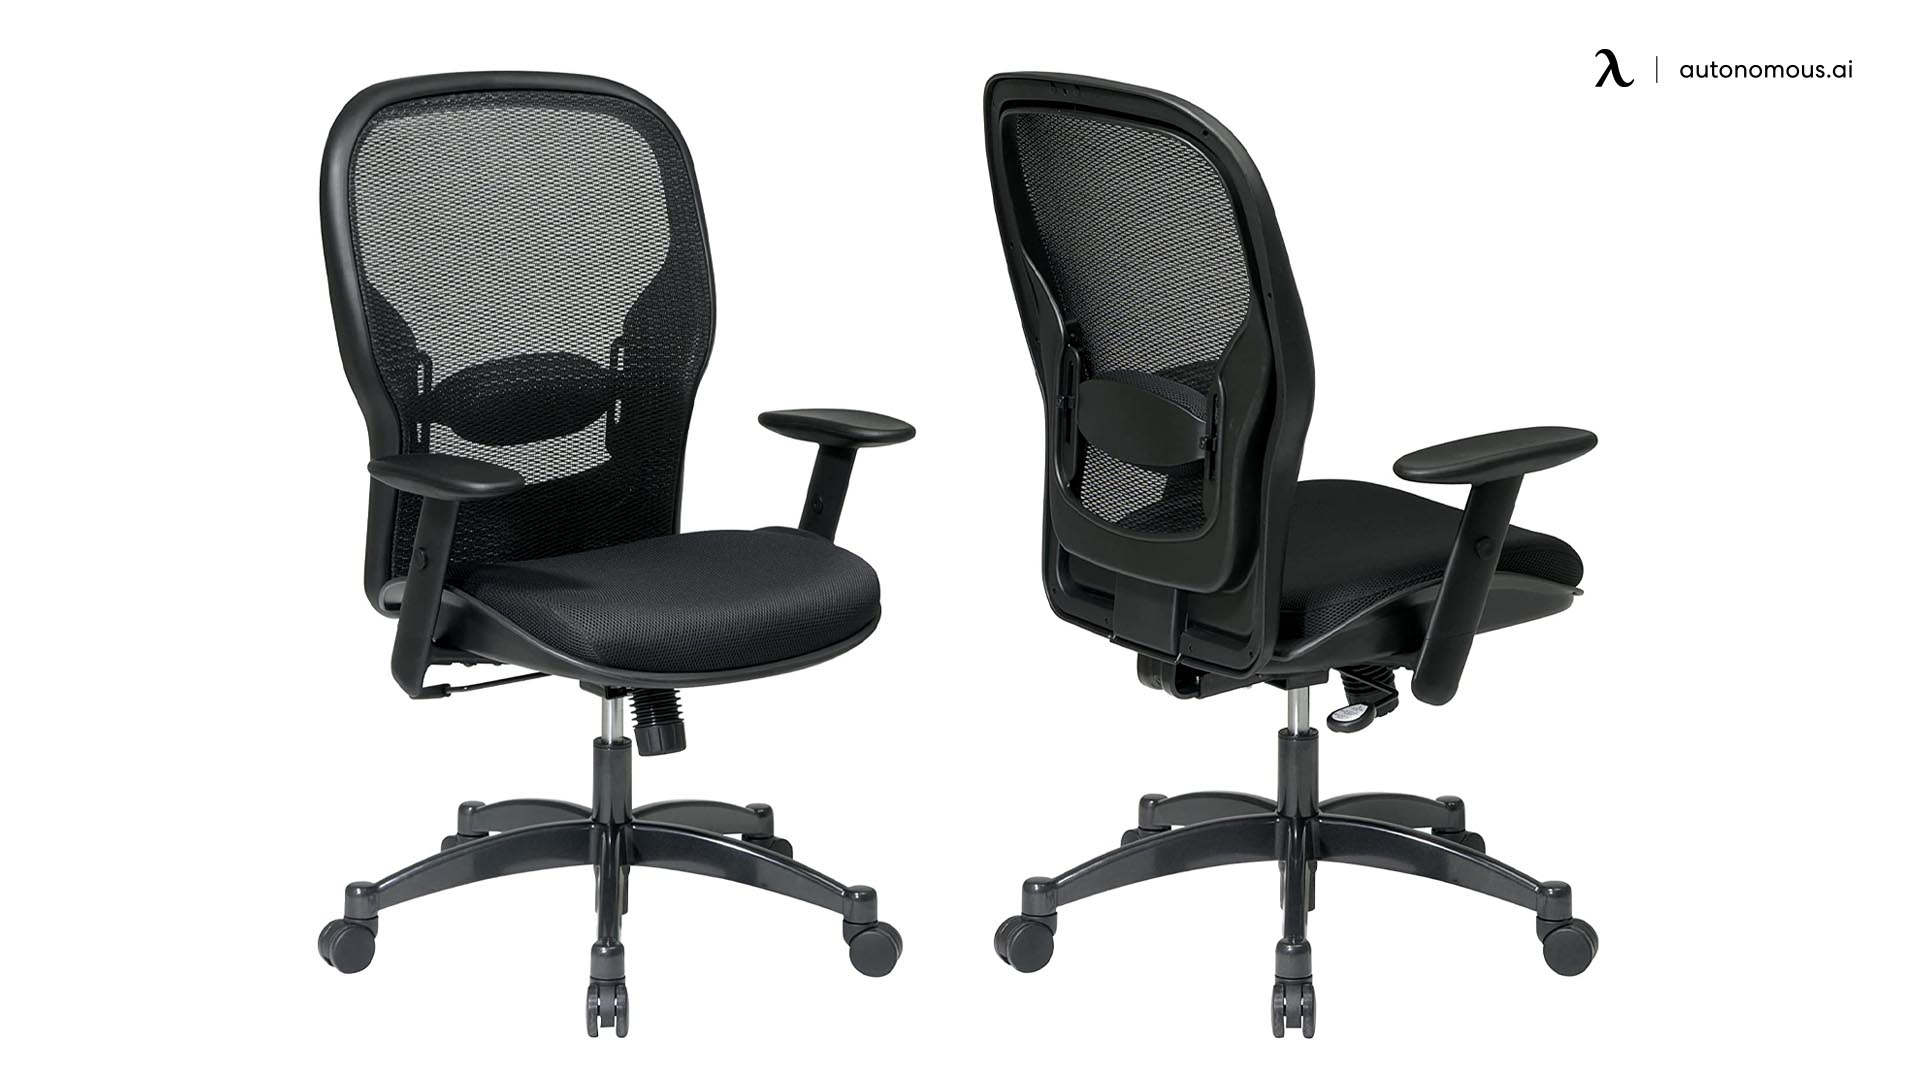 Space Seating Ergonomic Mesh Chair